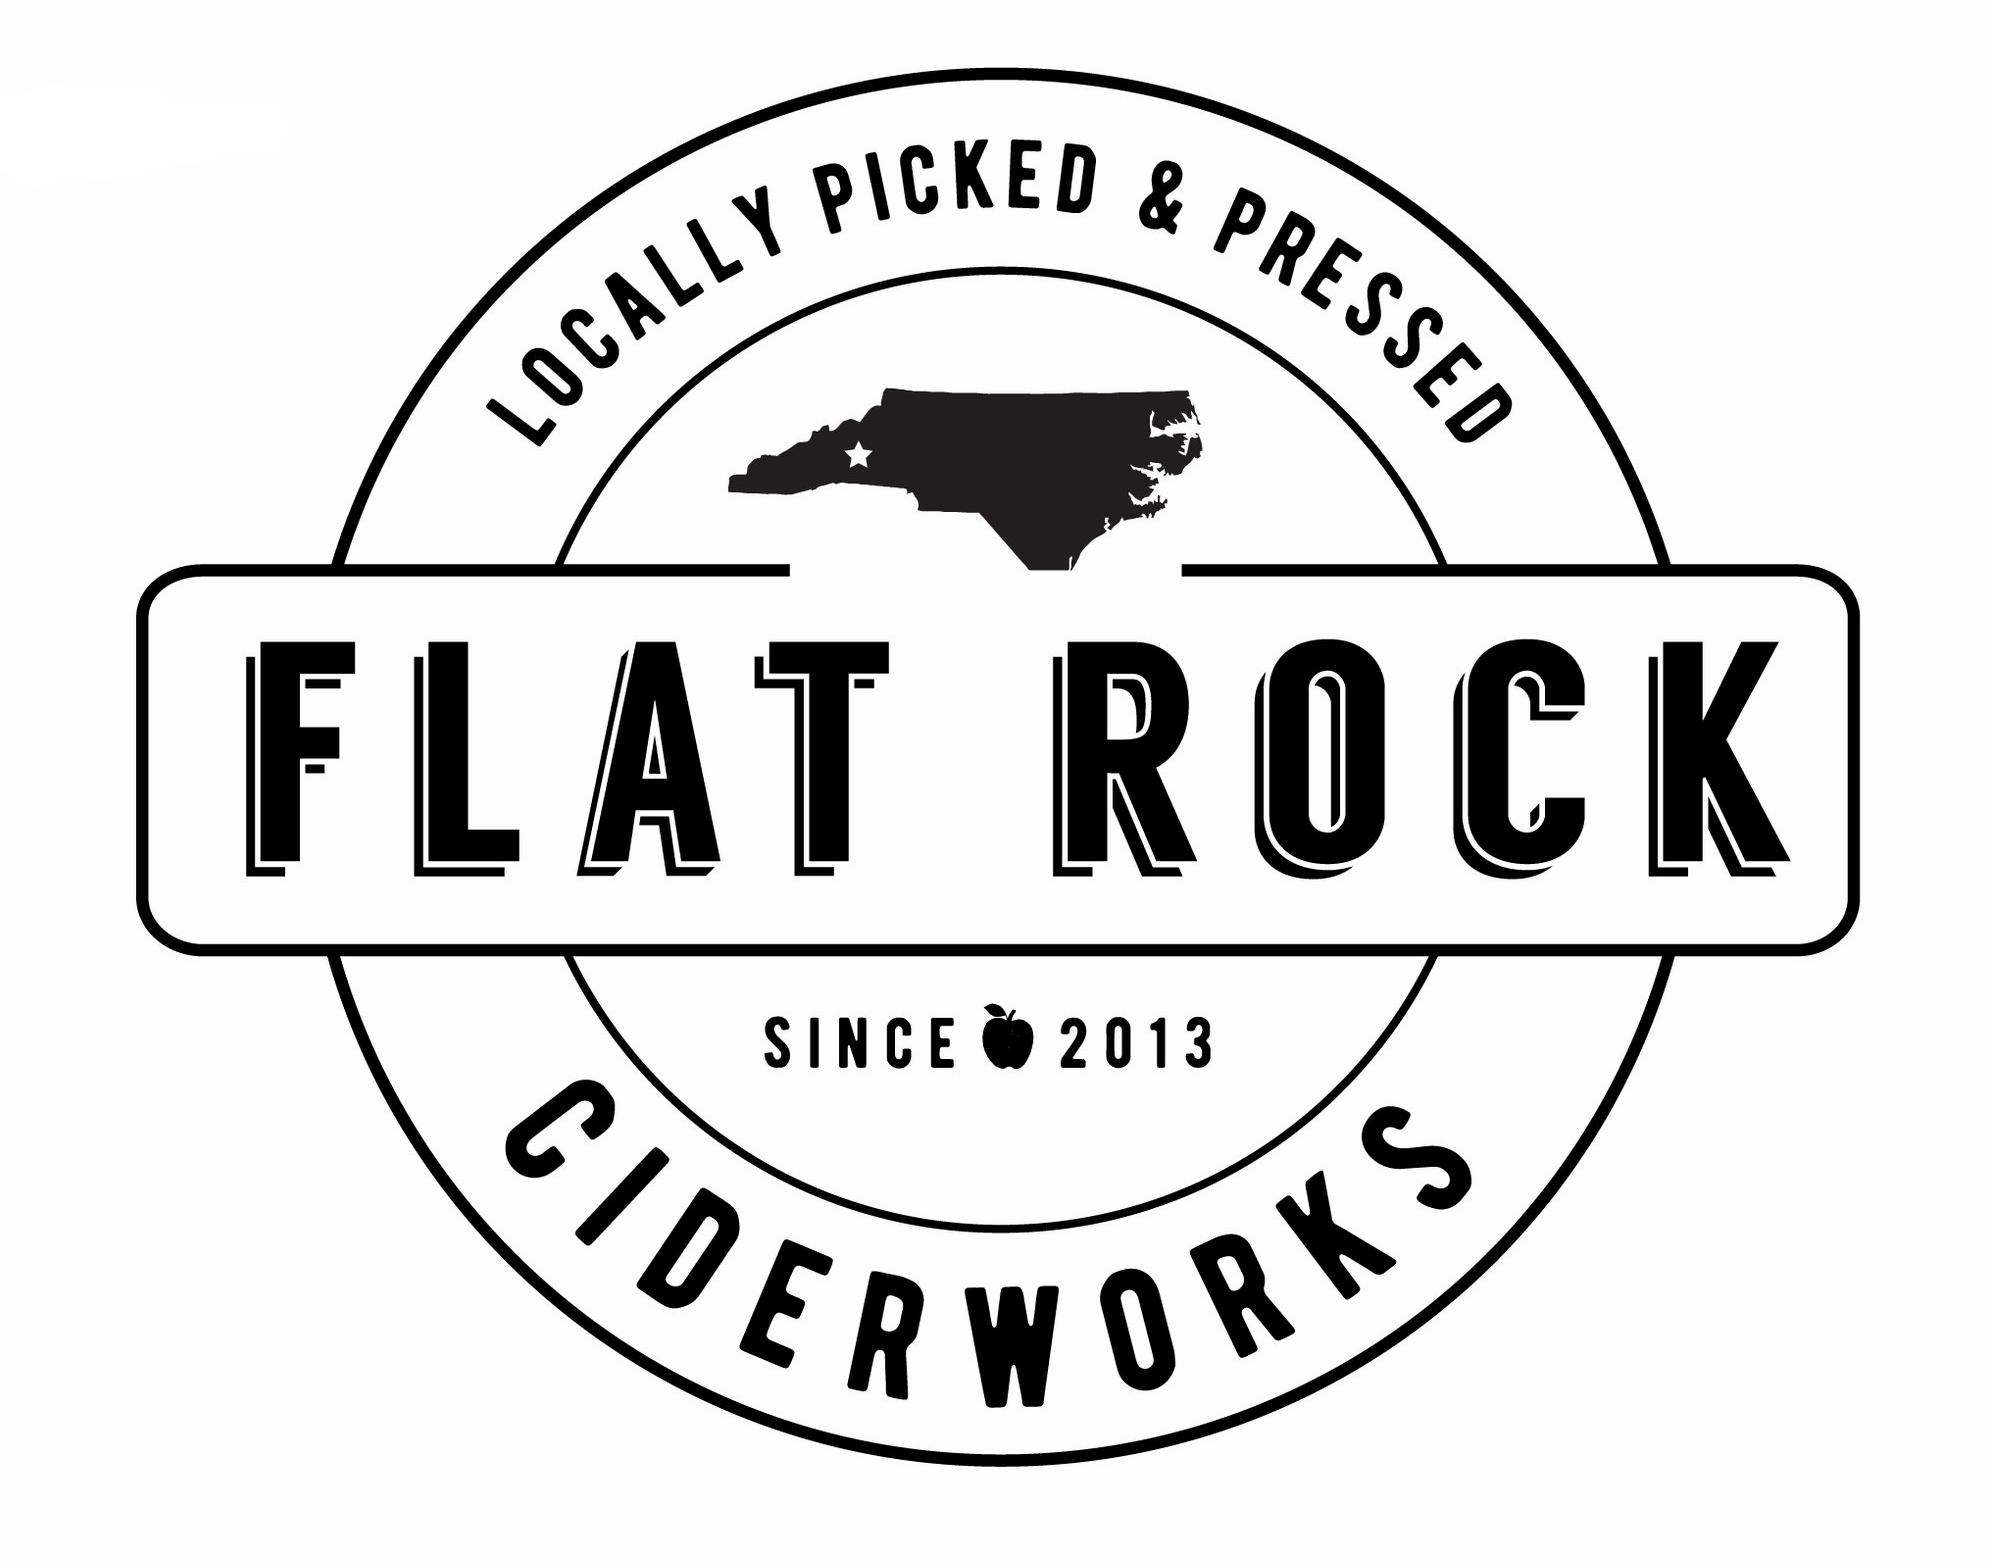 FlatRock-LogoConcepts-Final-Variation1-01.jpg